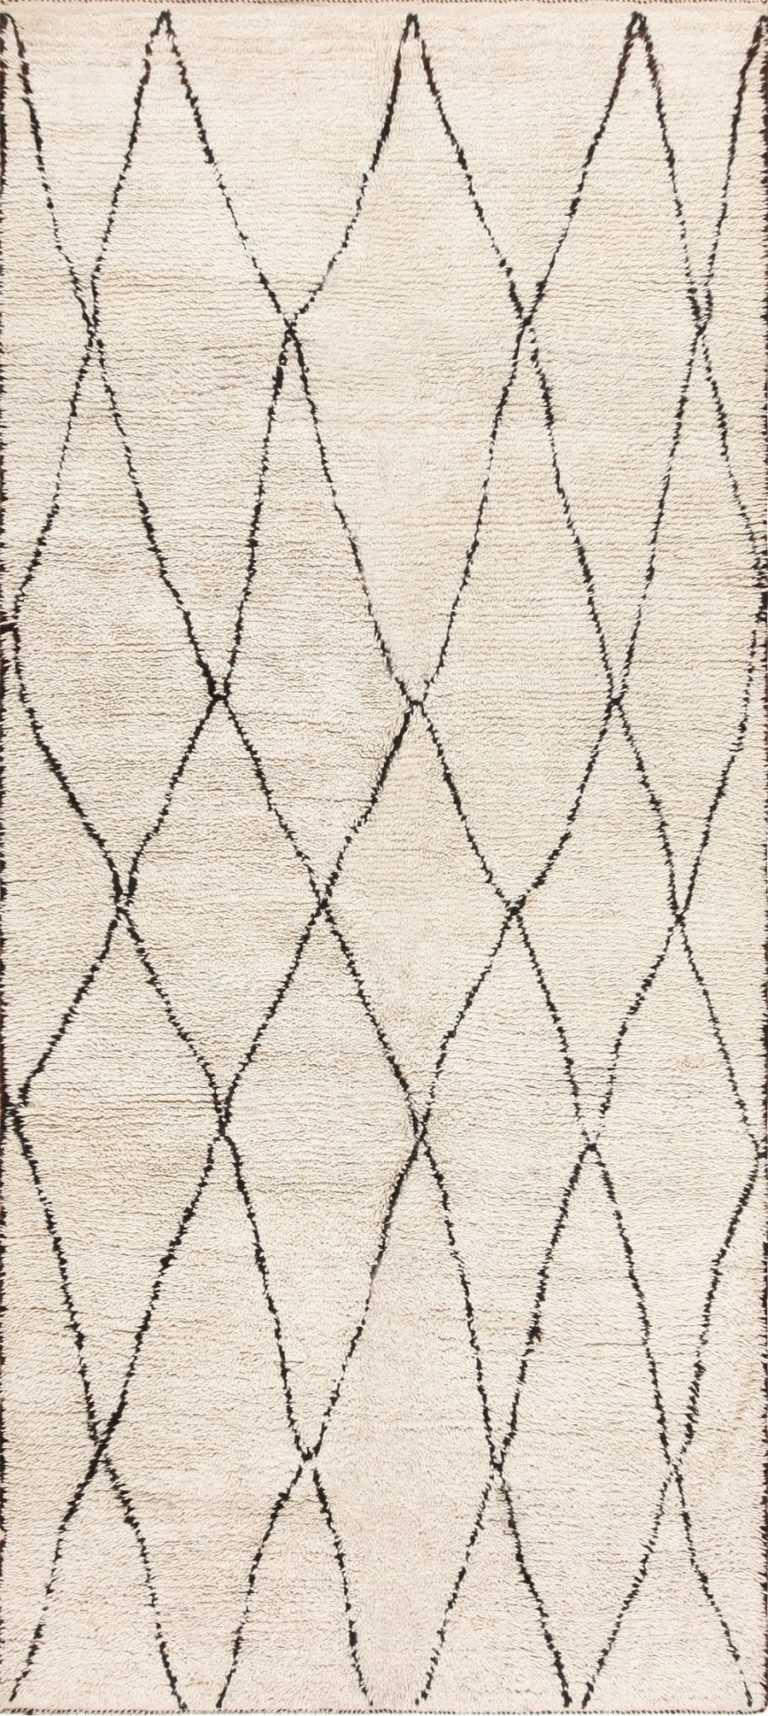 Cream and Black Vintage Moroccan Beni Ourain Carpet 47928 Nazmiyal